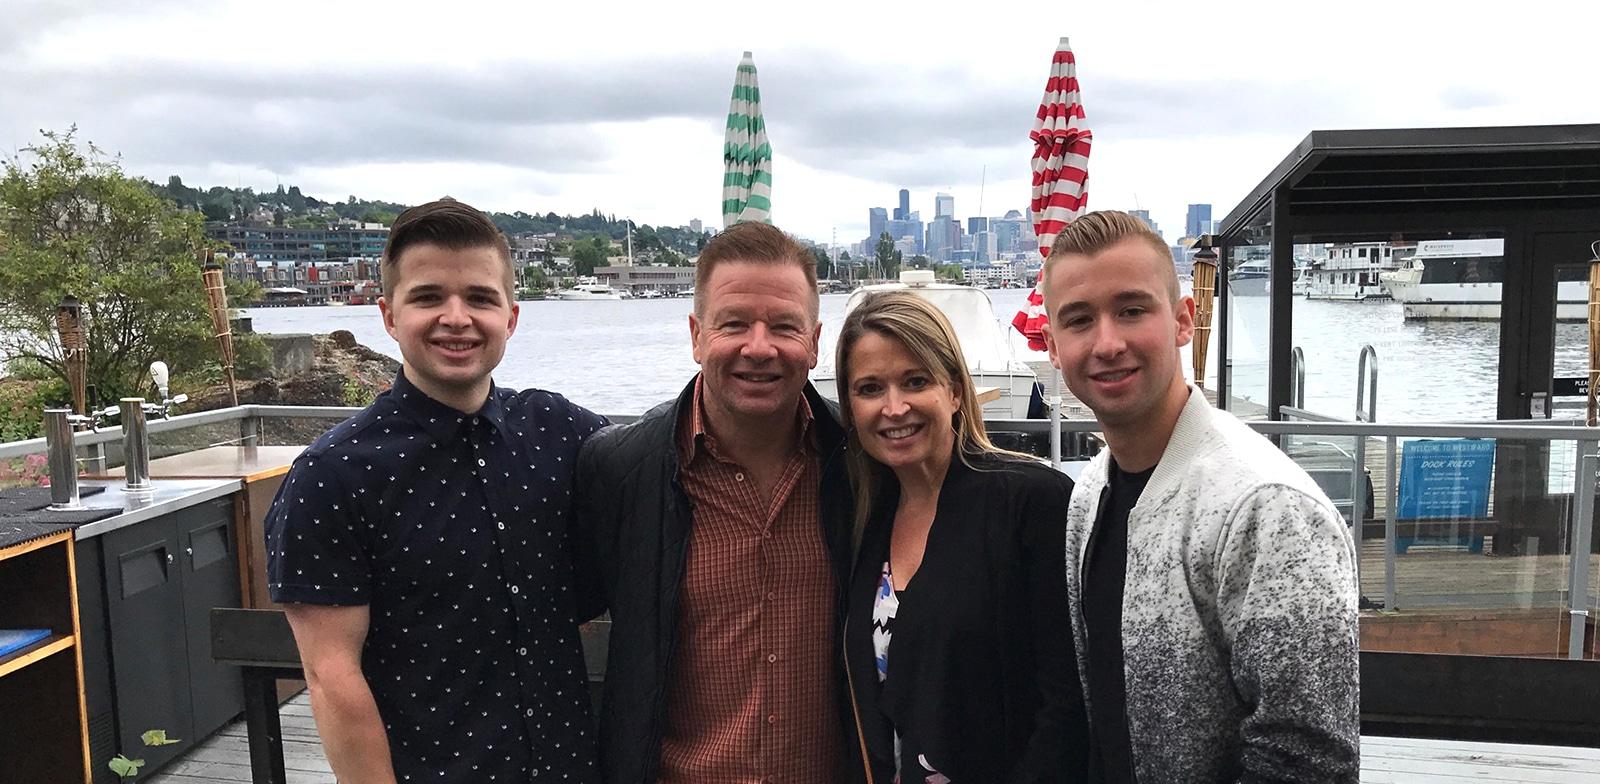 Randy and Raye-Lynn Jassman Family By Water